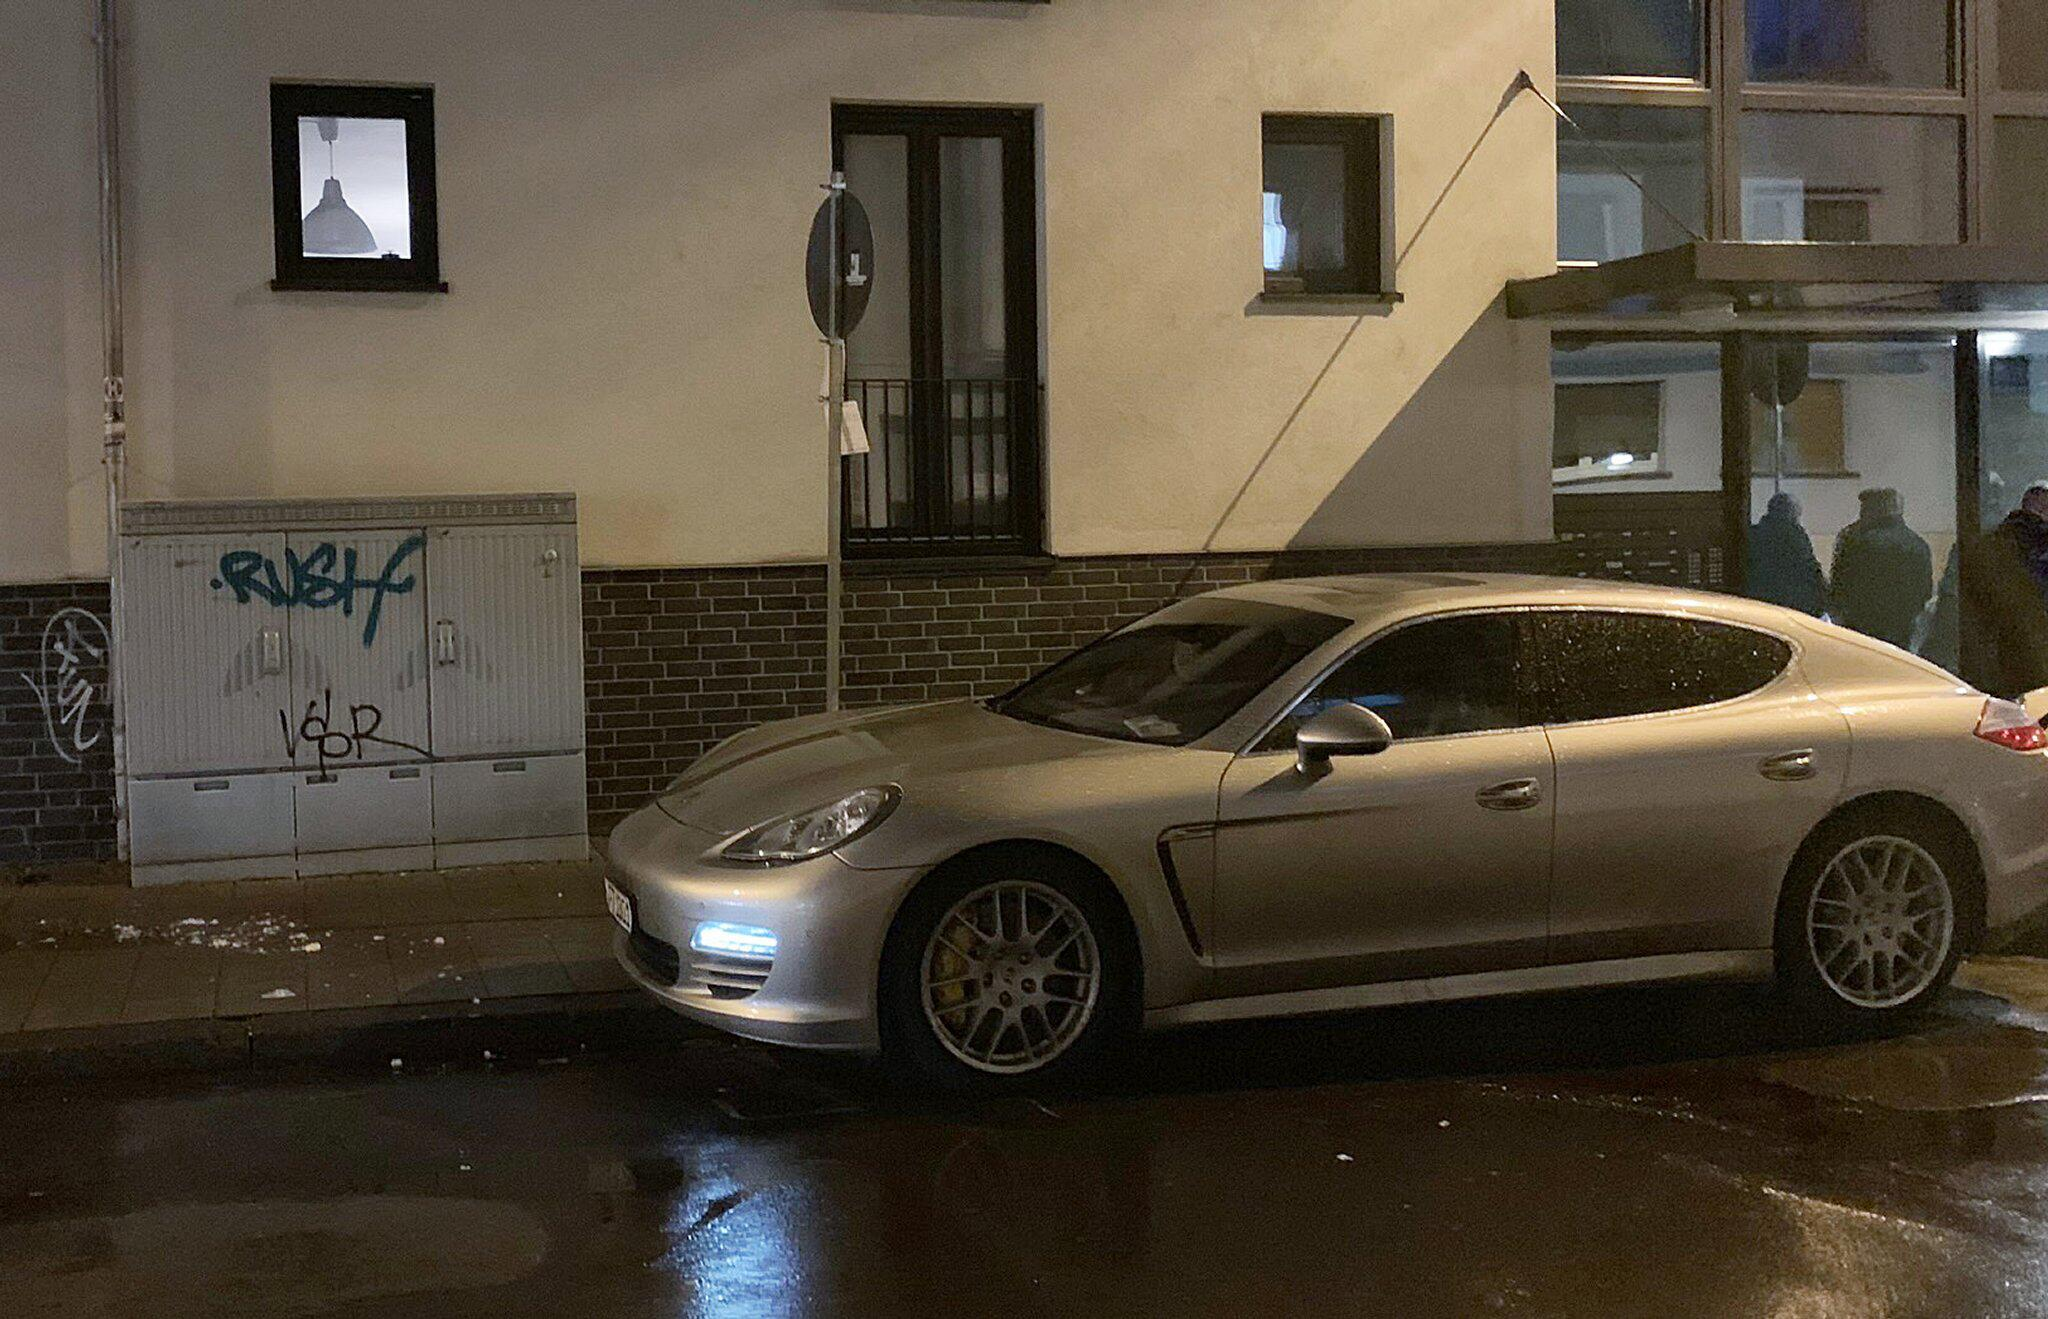 Bild zu Frau in Offenbach erschossen